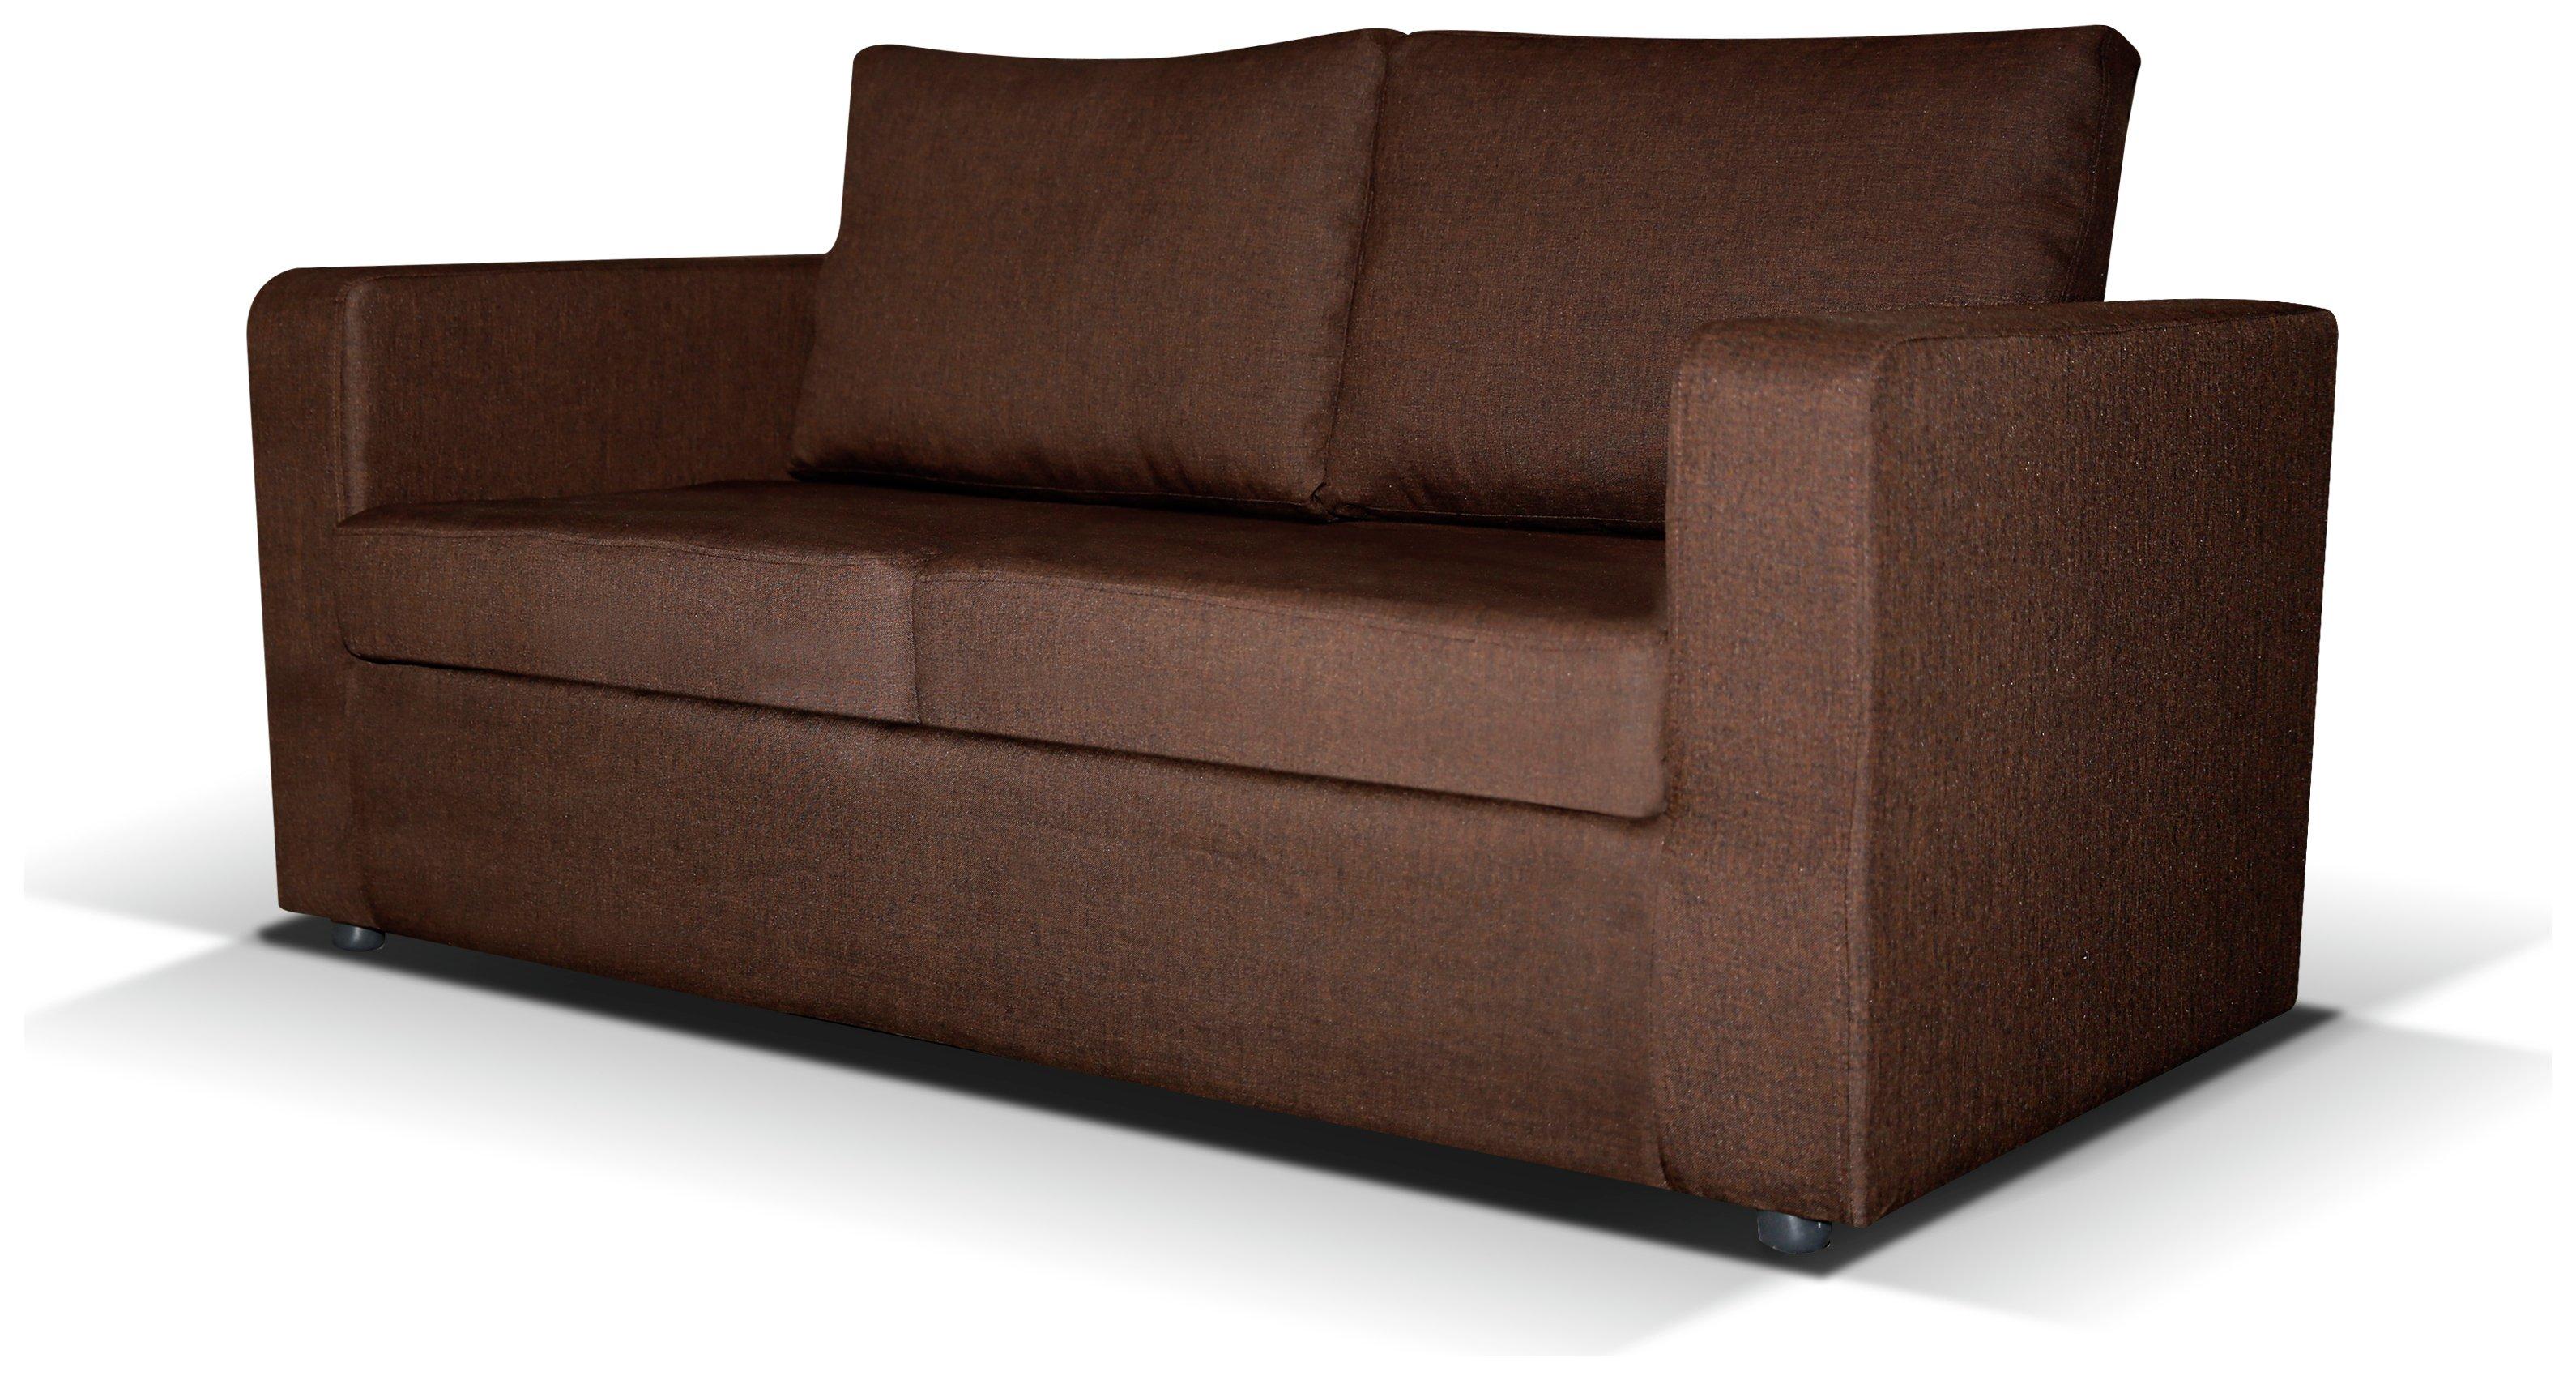 fabric chesterfield sofa argos bizzarto max 2 seater bed chocolate 399 99 octer